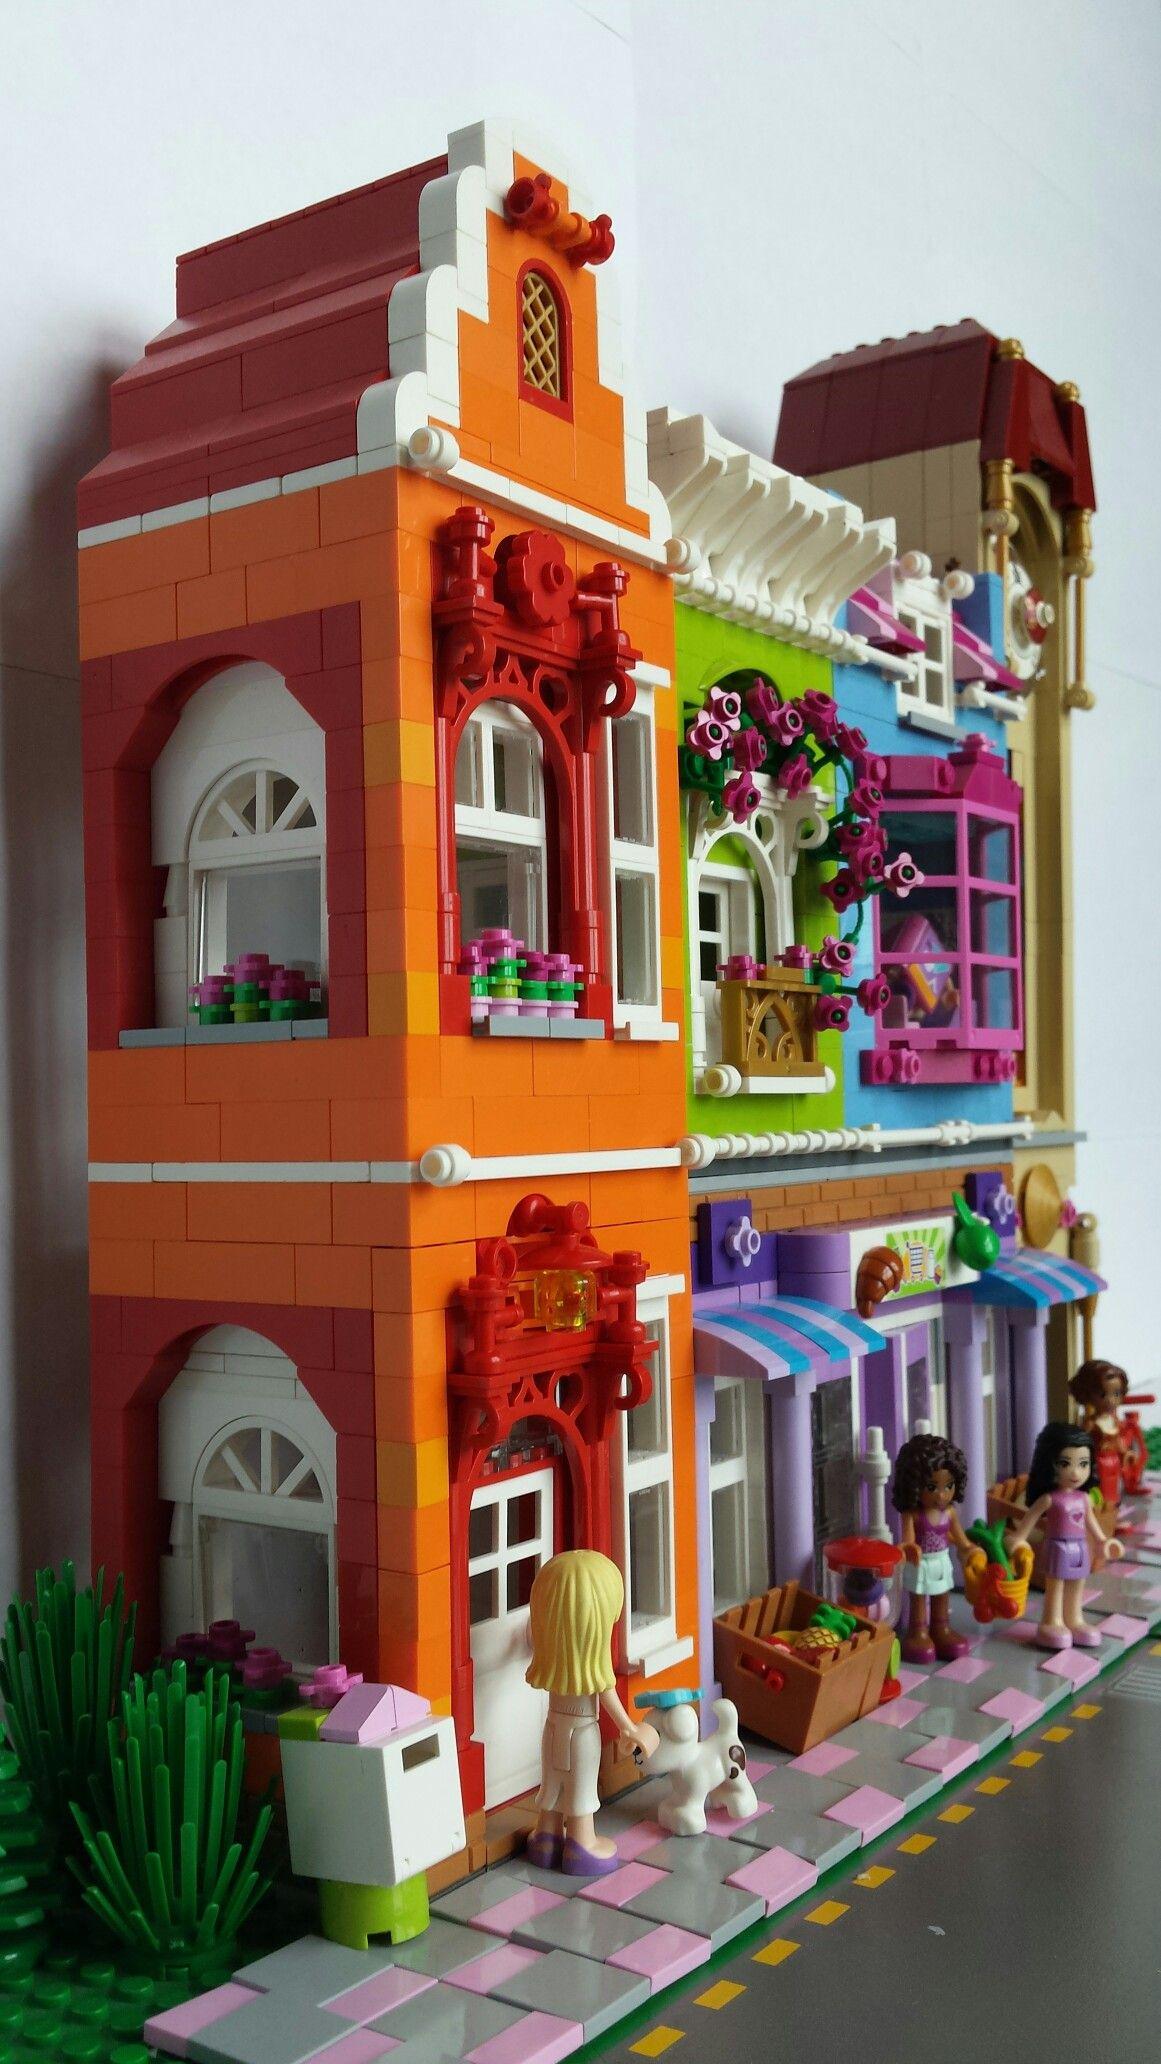 Lego Friends Street Lego Pinterest